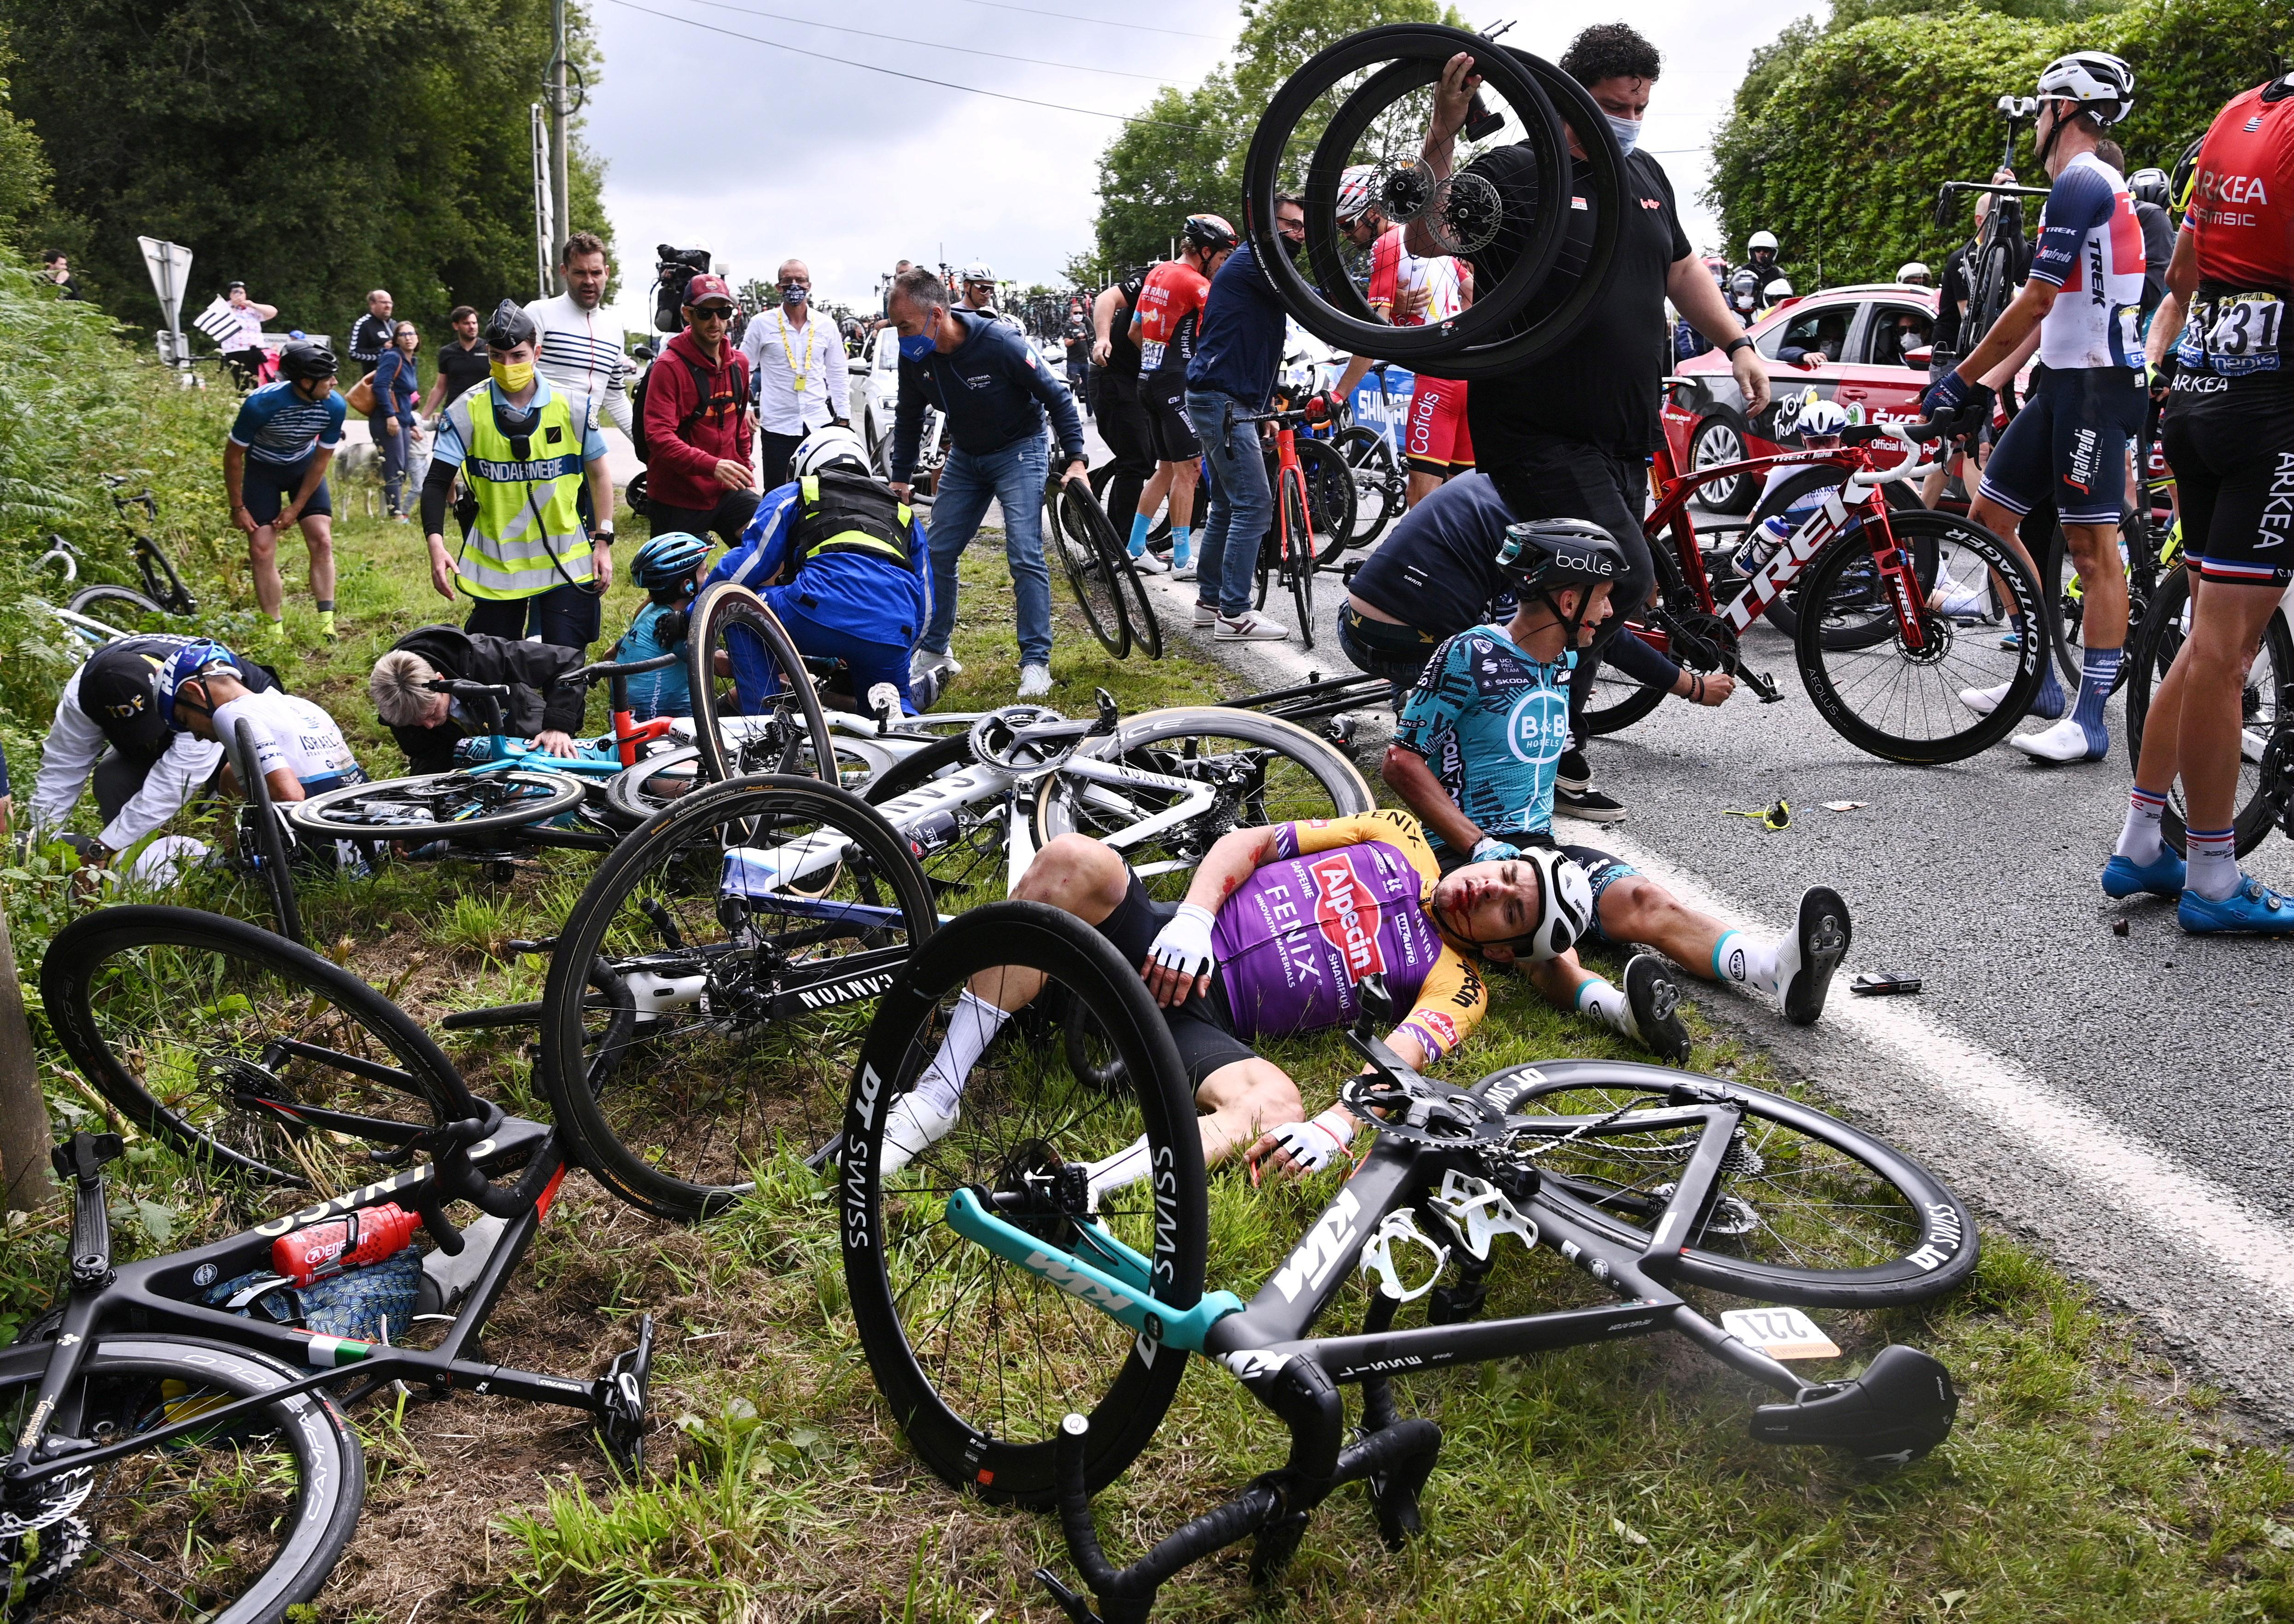 Cycling - Tour de France - Stage 1 - Brest to Landerneau - France - June 26, 2021 B&B Hotels p/b KTM rider Bryan Coquard of France reacts after a crash REUTERS/Anne-Christine Poujoulat